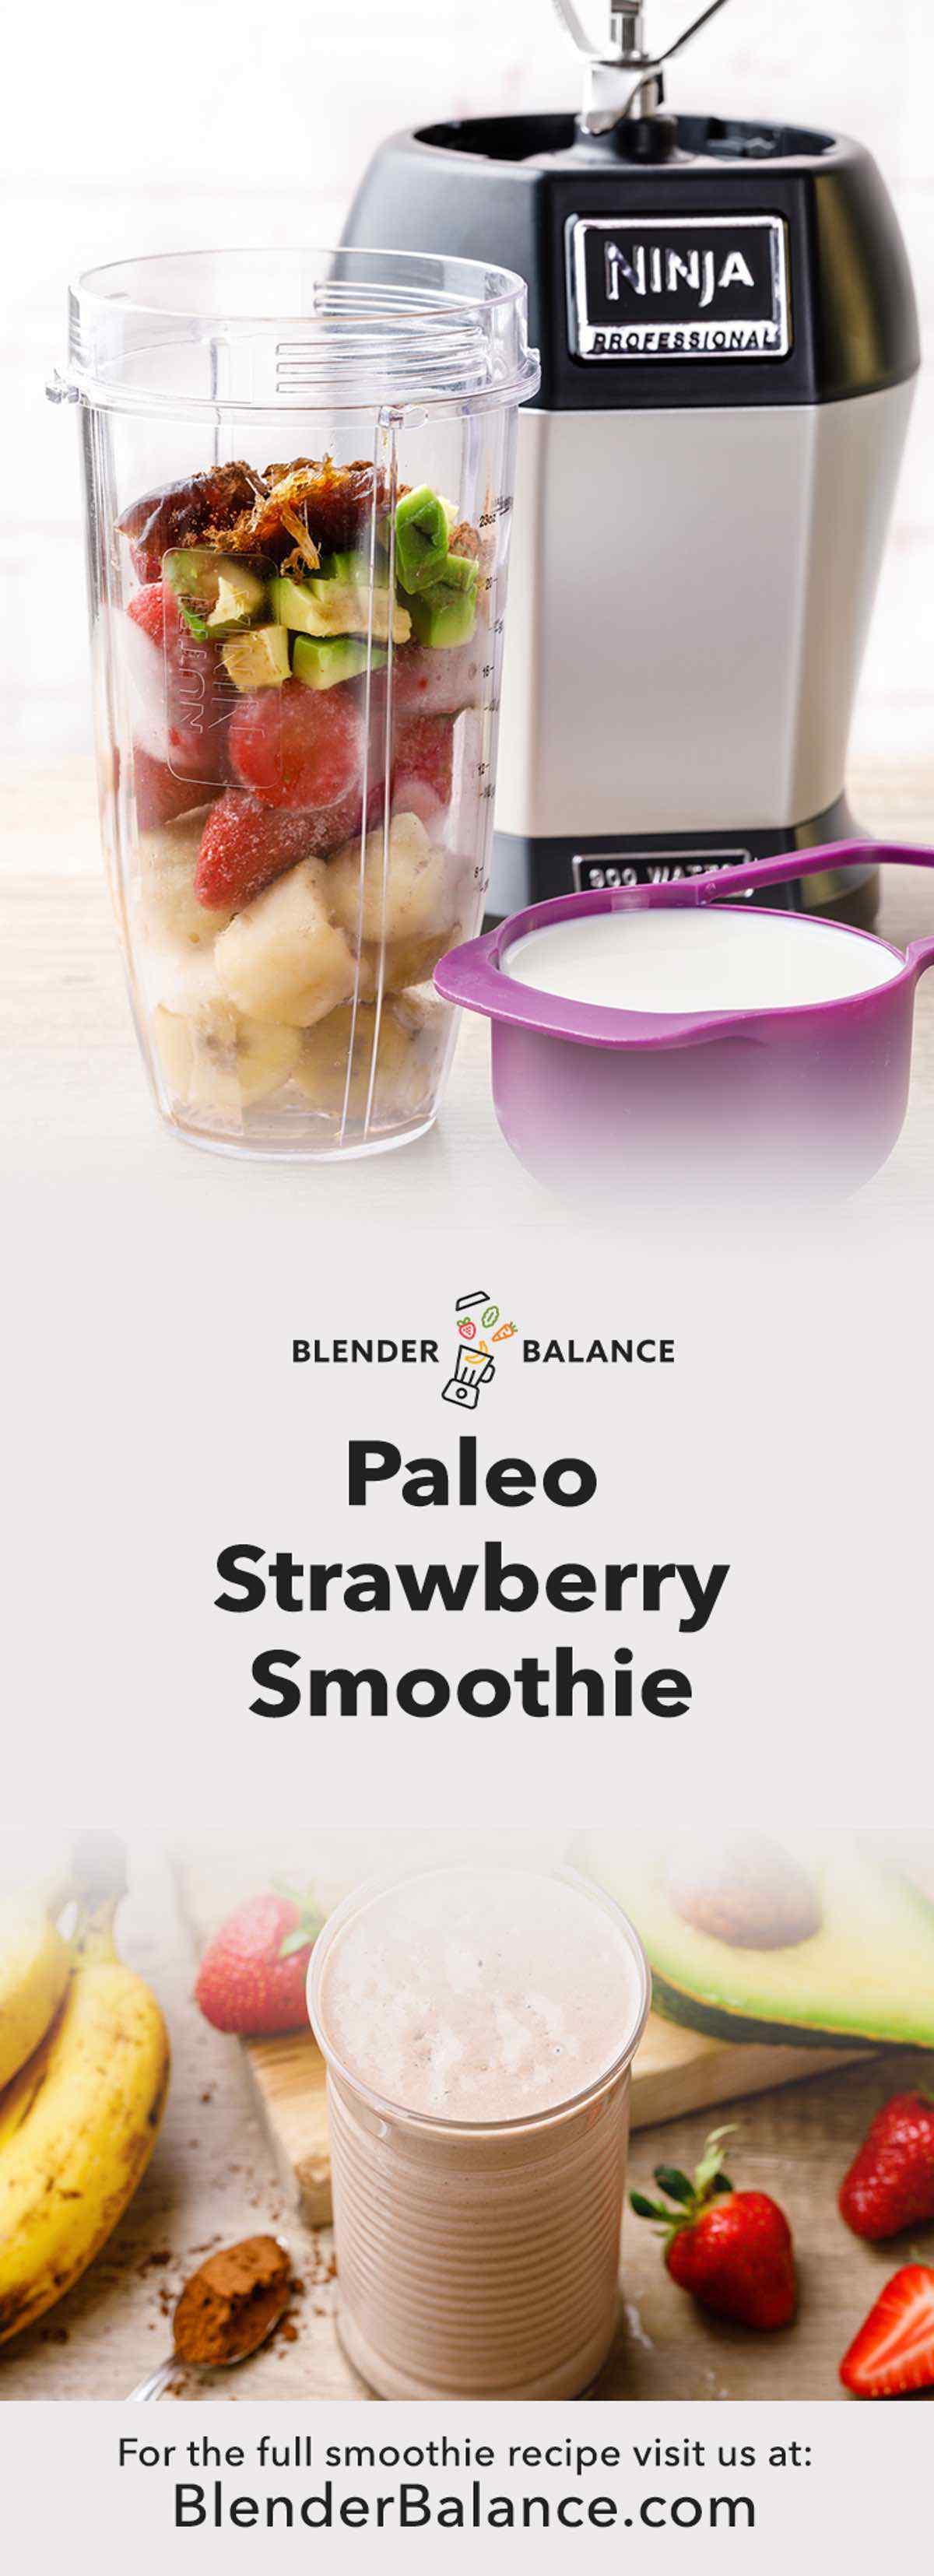 Paleo Strawberry Smoothie